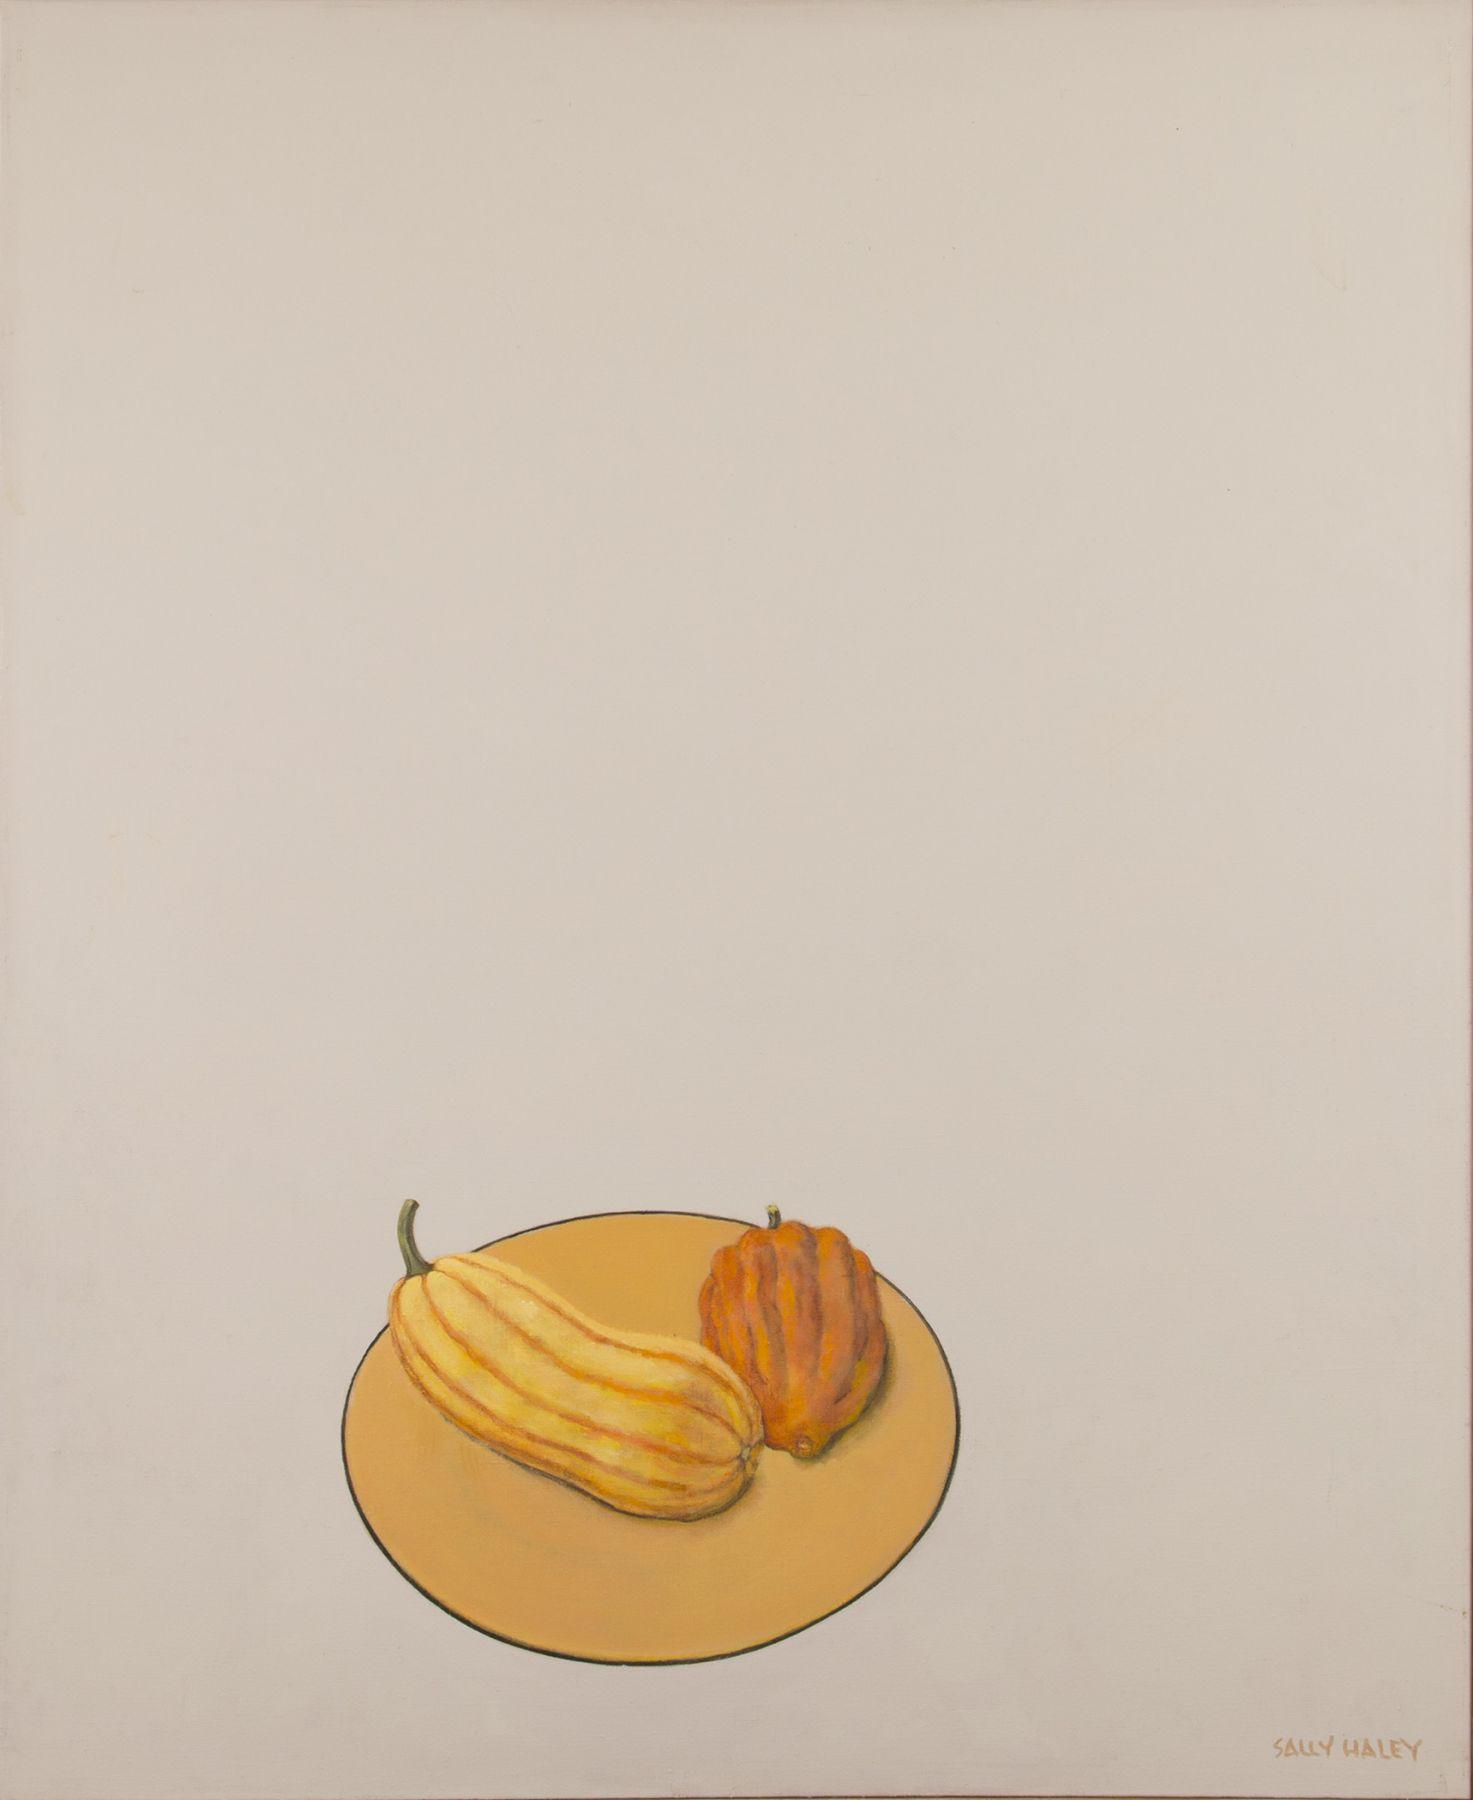 Haley - Delicata and acorn